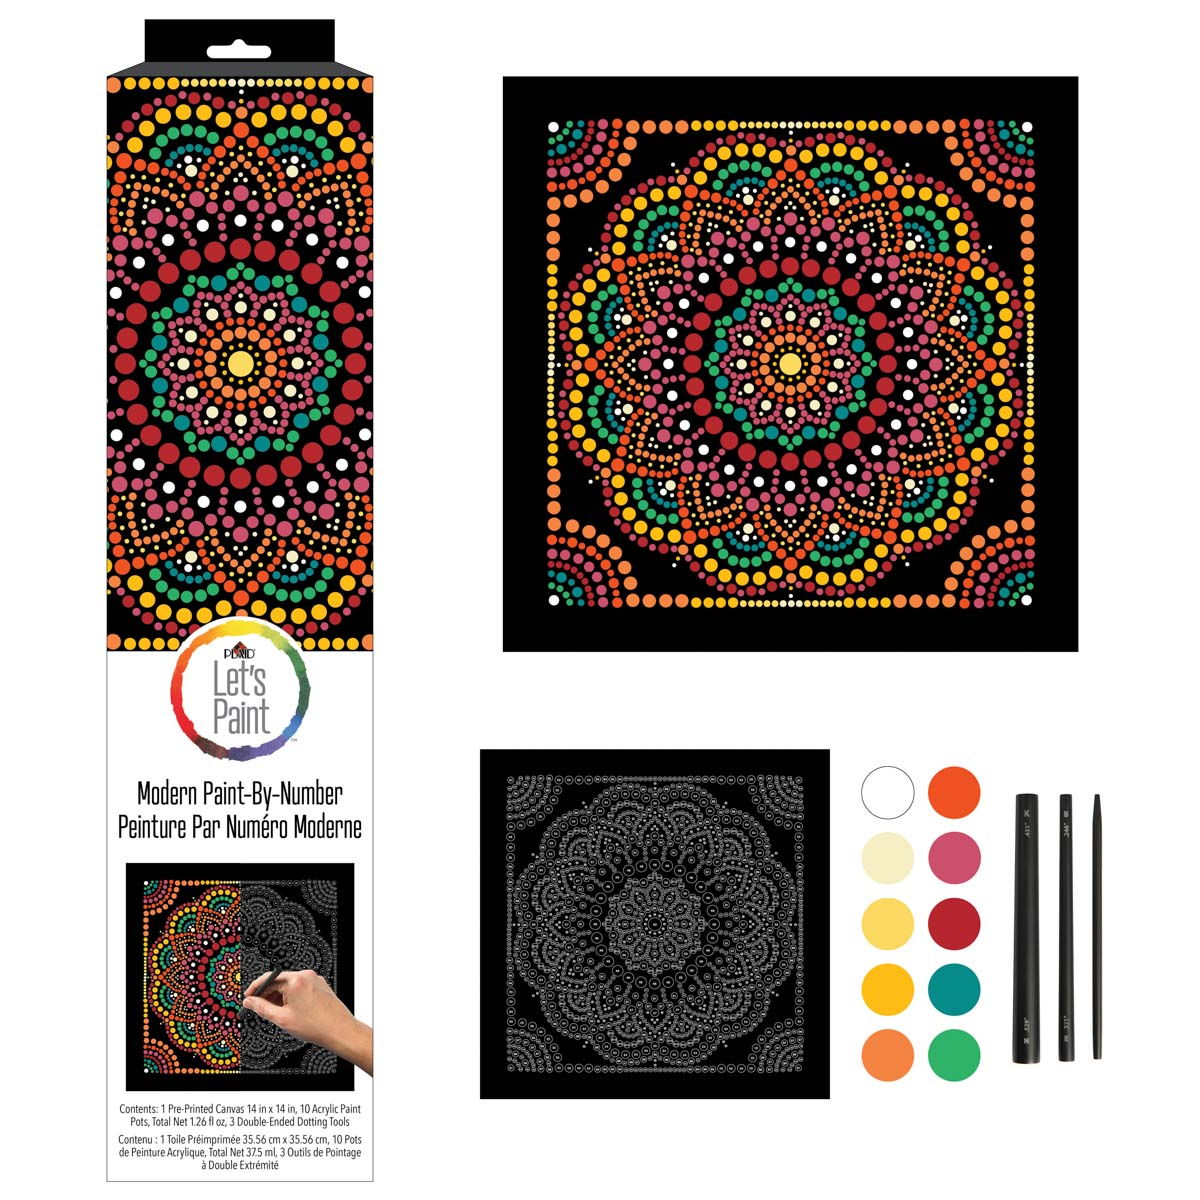 Plaid ® Let's Paint™ Mandala Dot-by-Number - Dot Frame - 17908